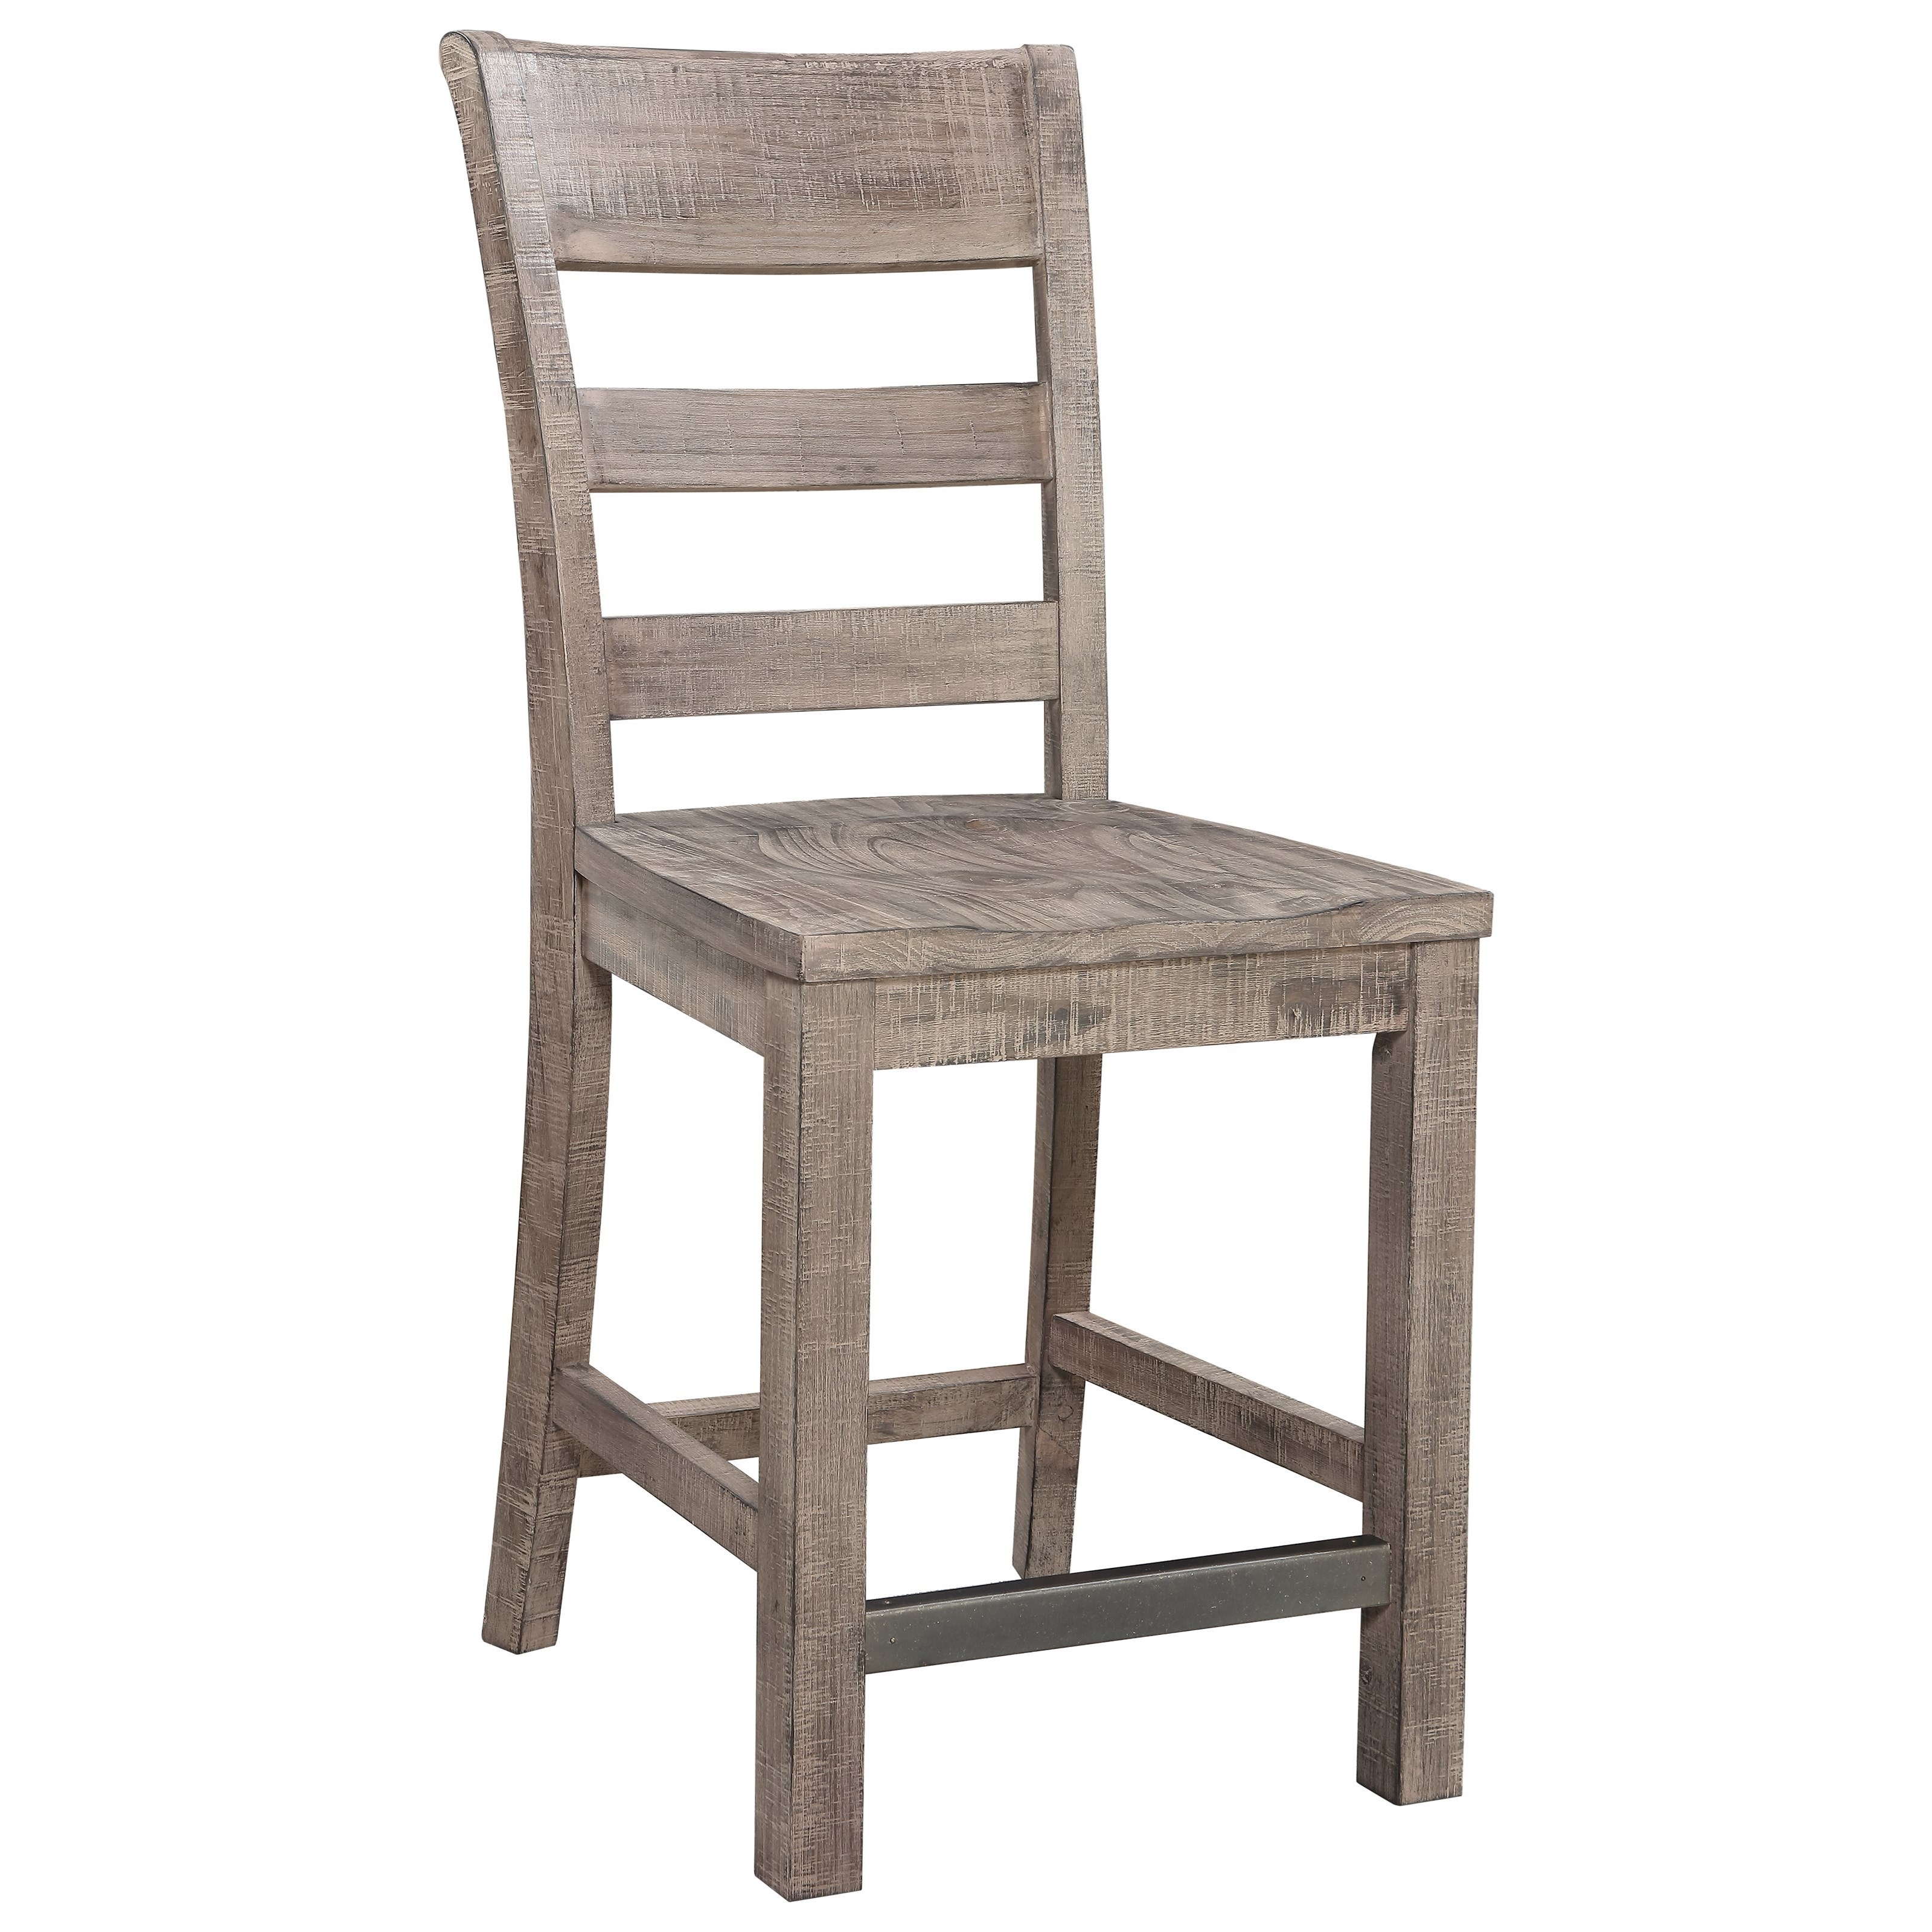 Dakota 24'' Slat Back Barstool with Wood Seat by Emerald at Northeast Factory Direct